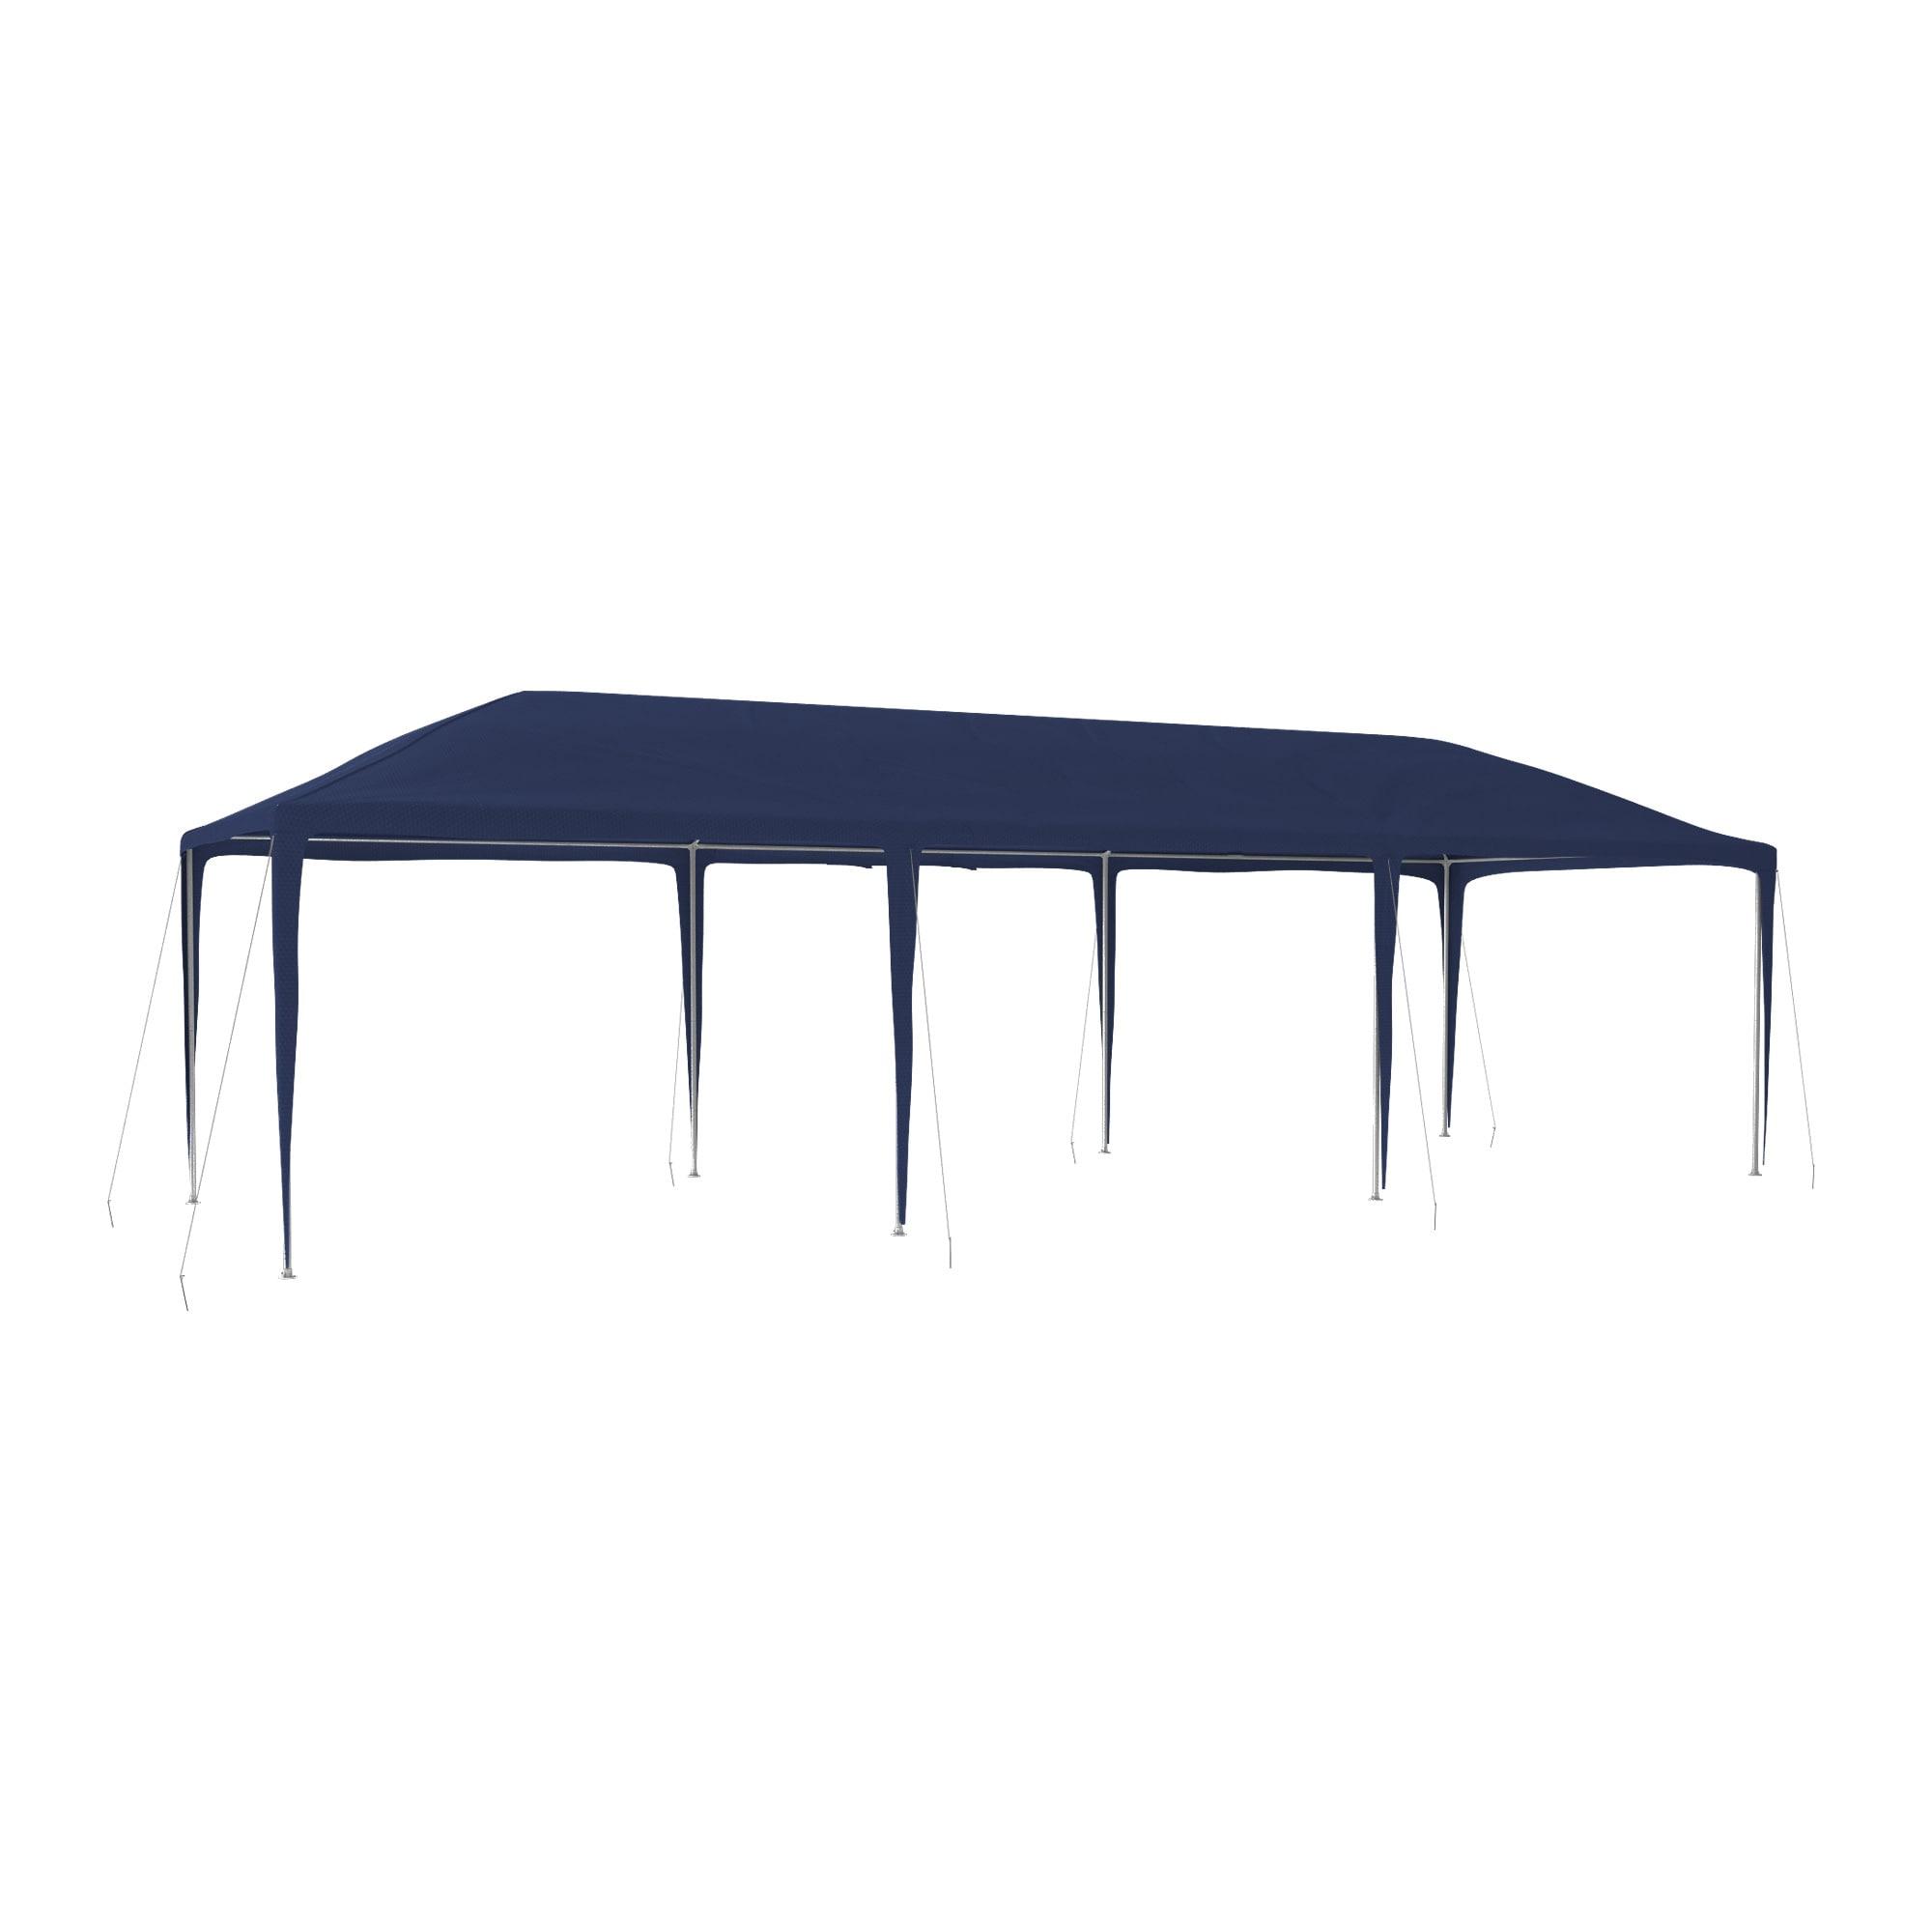 jarolift steckpavillon pavillon pavillion gartenzelt partyzelt 3x3m 3x6m 3x9m ebay. Black Bedroom Furniture Sets. Home Design Ideas